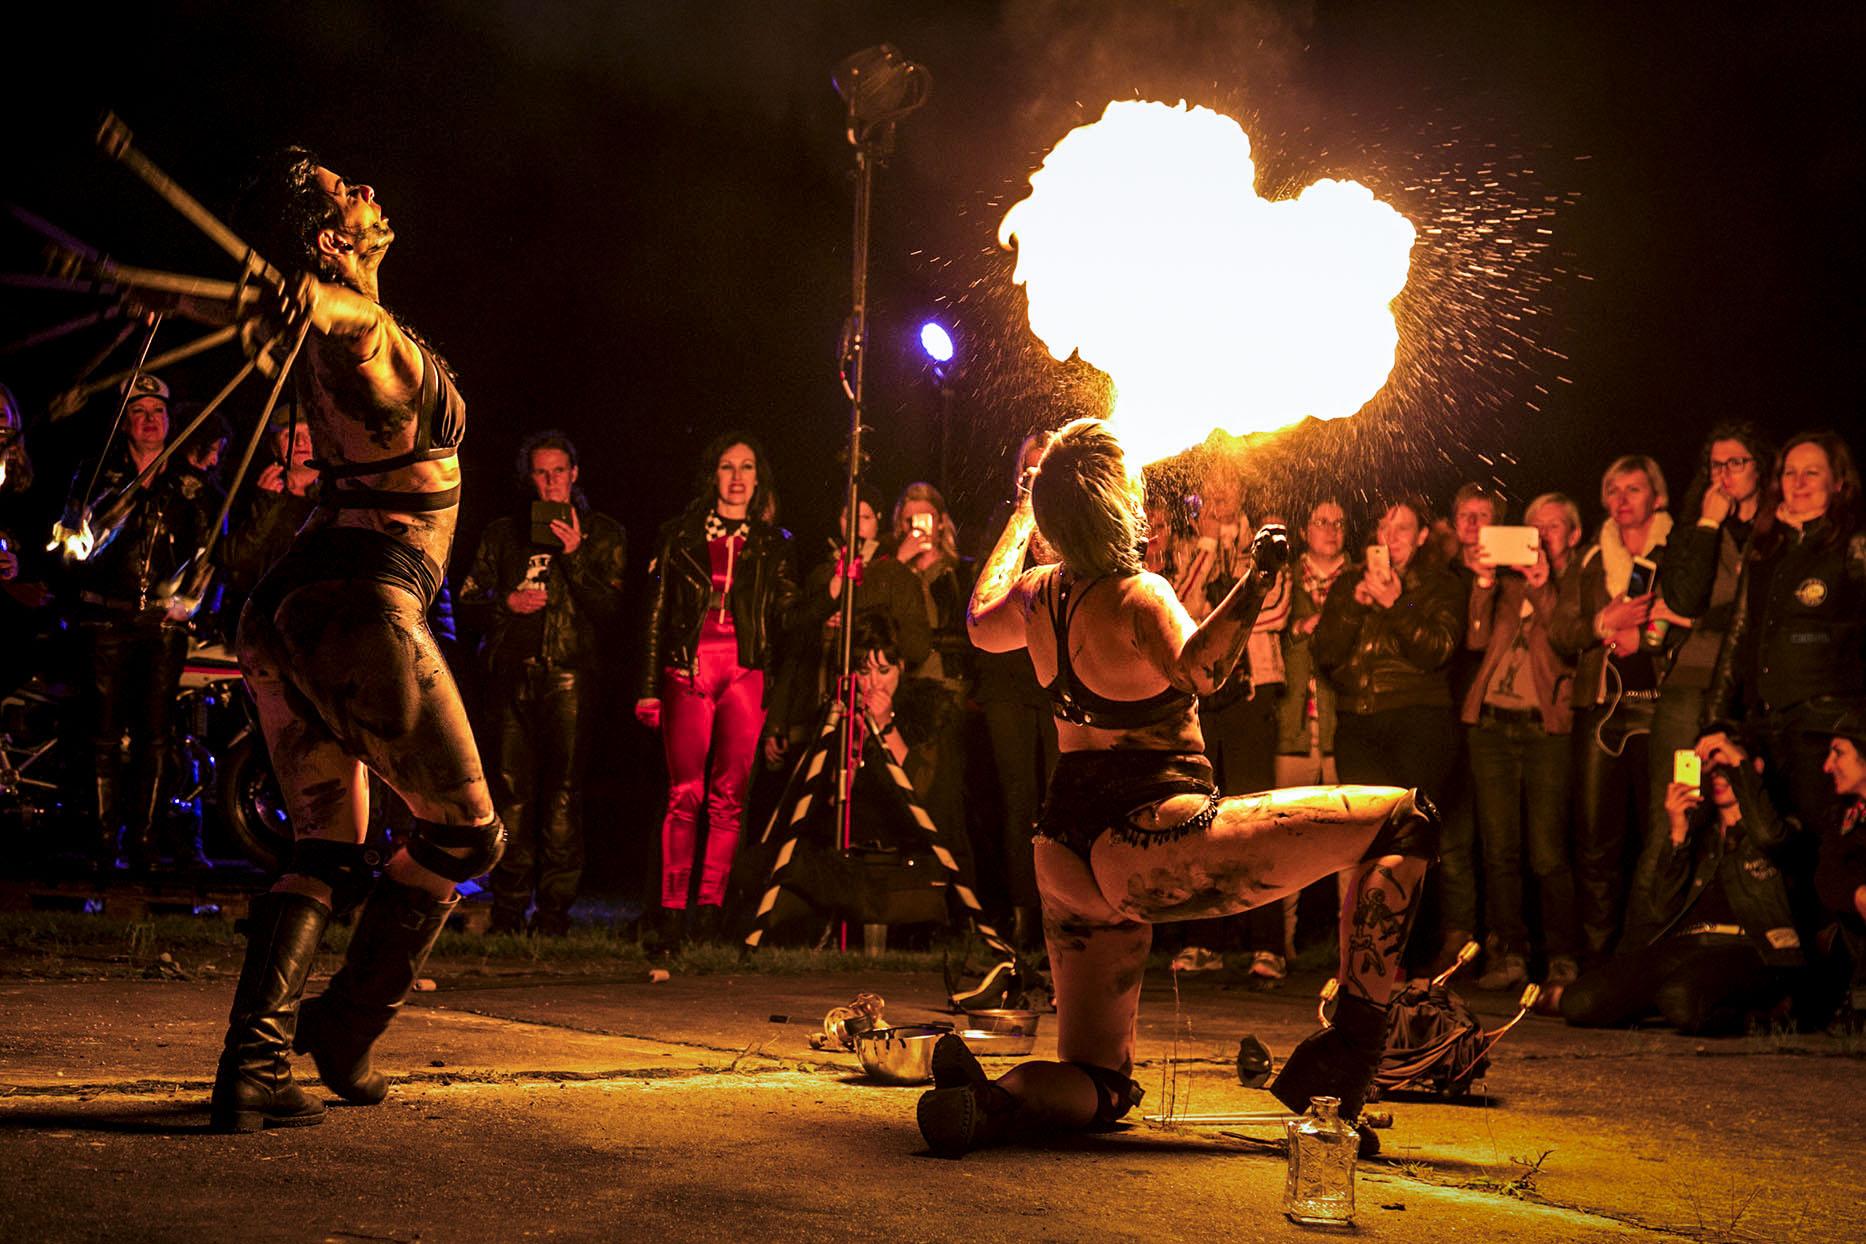 Fire dancers, Petrolettes Festival | Neuhardenberg, Germany